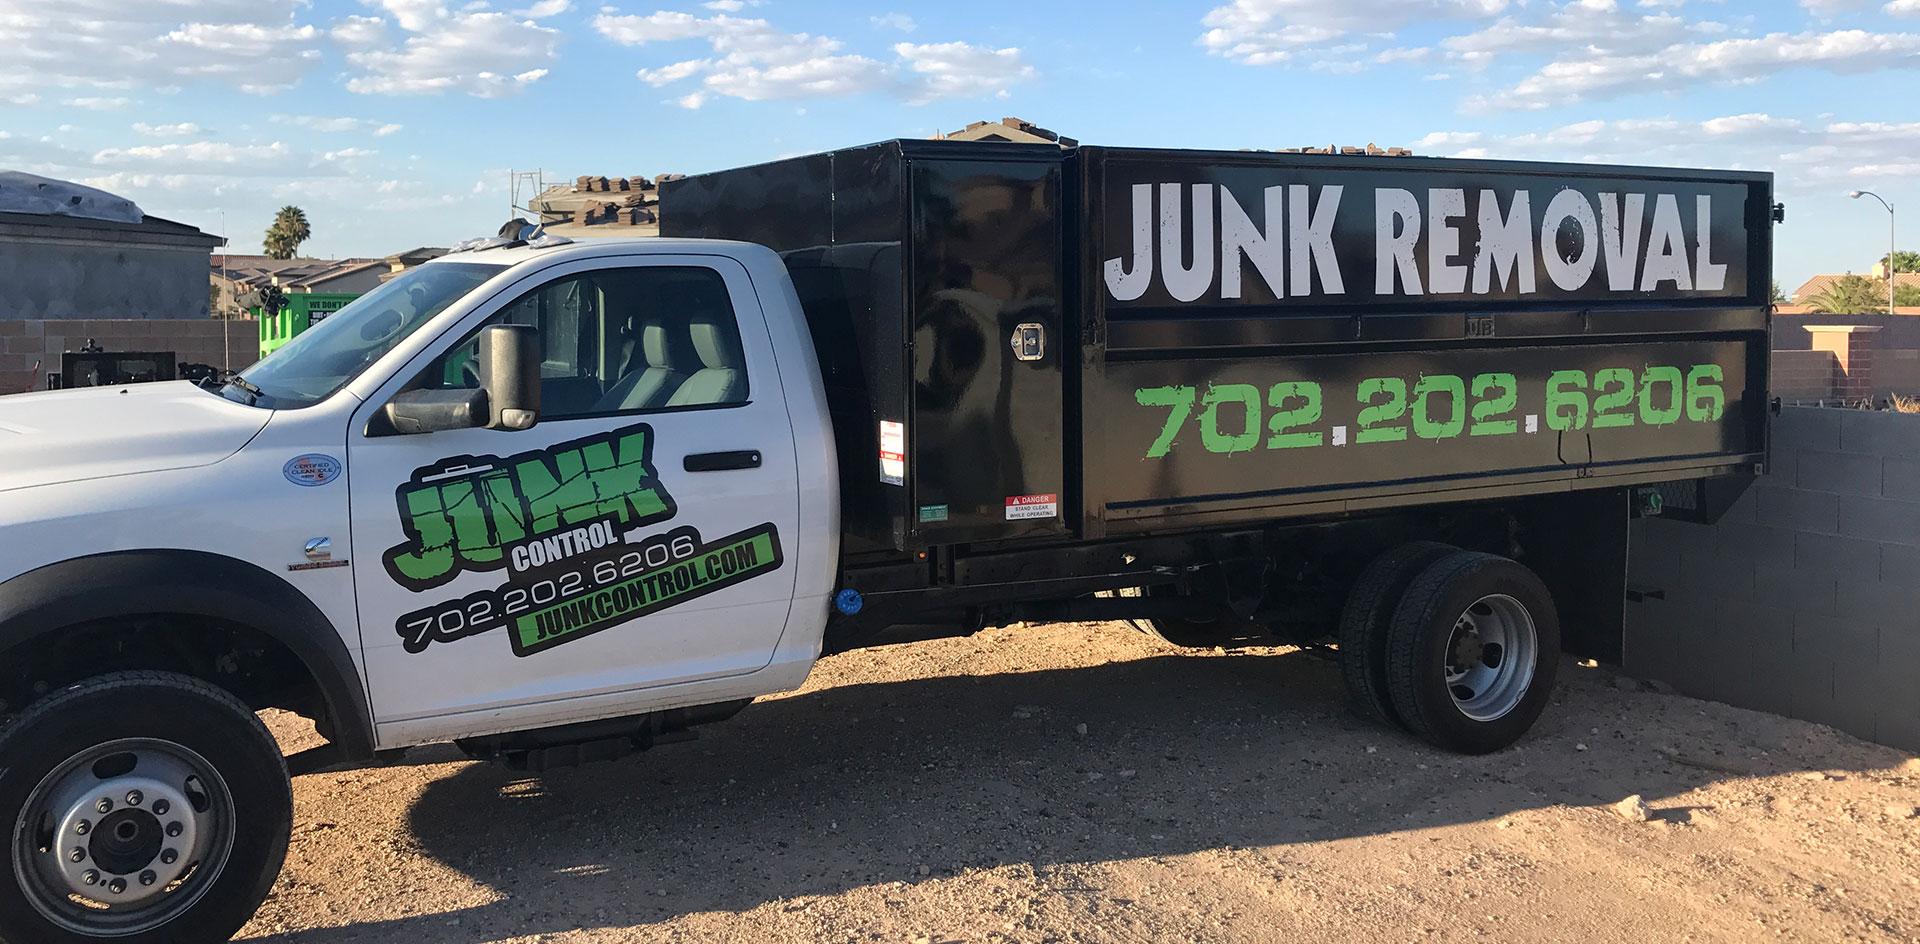 Junk Control Las Vegas - 5 Quick Tips For Junk Removal In Las Vegas